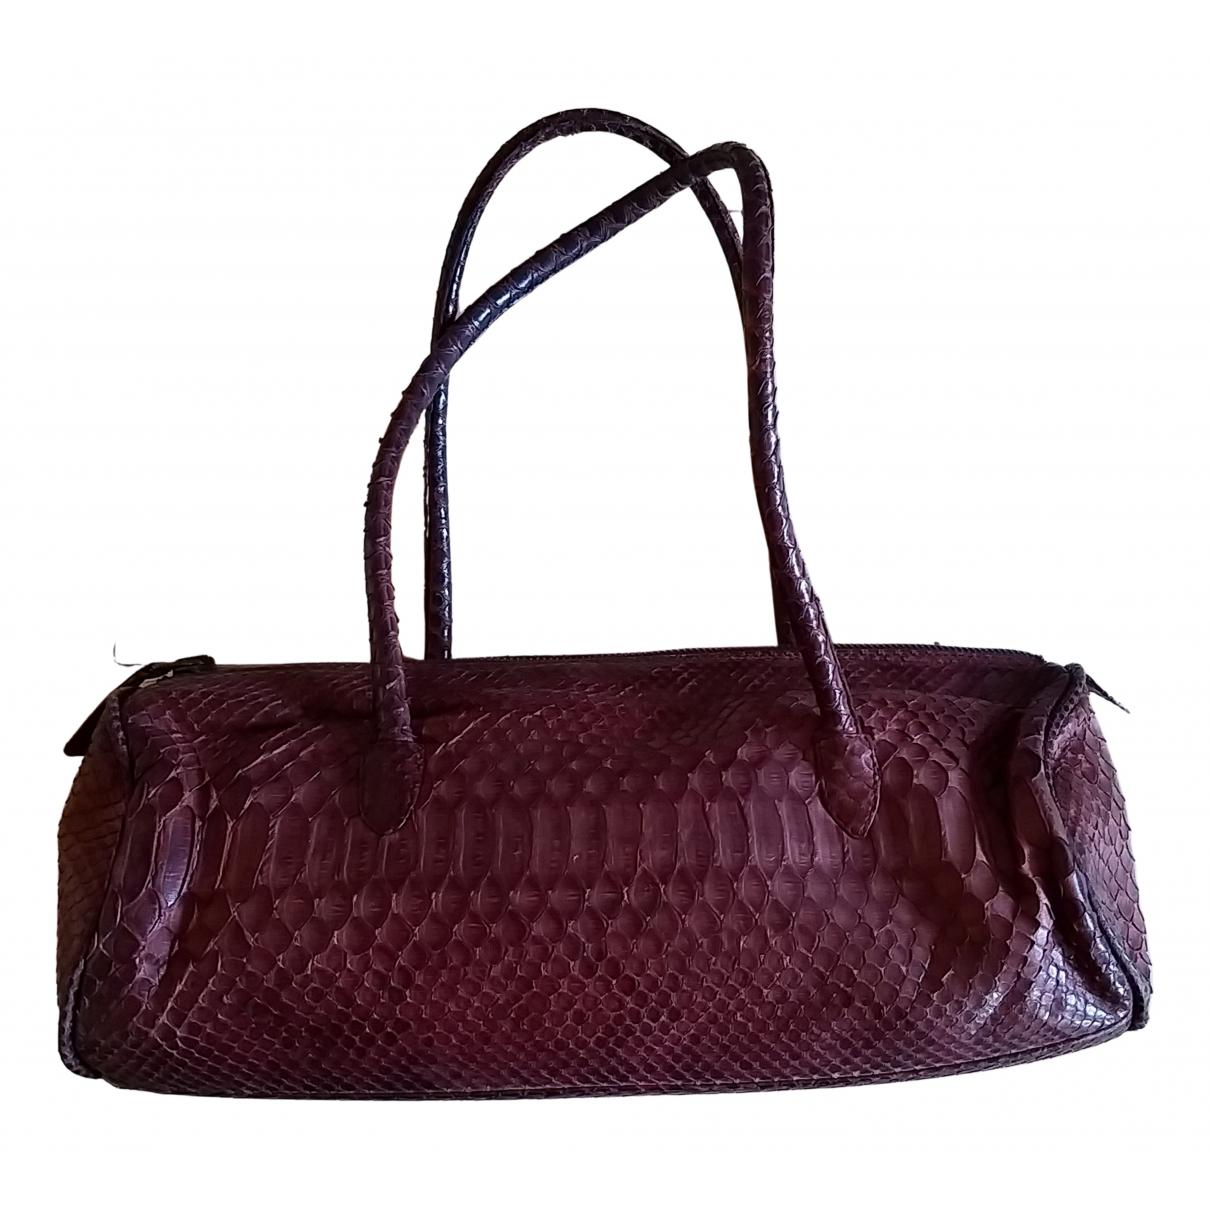 Reptiles House N Pink Alligator handbag for Women N